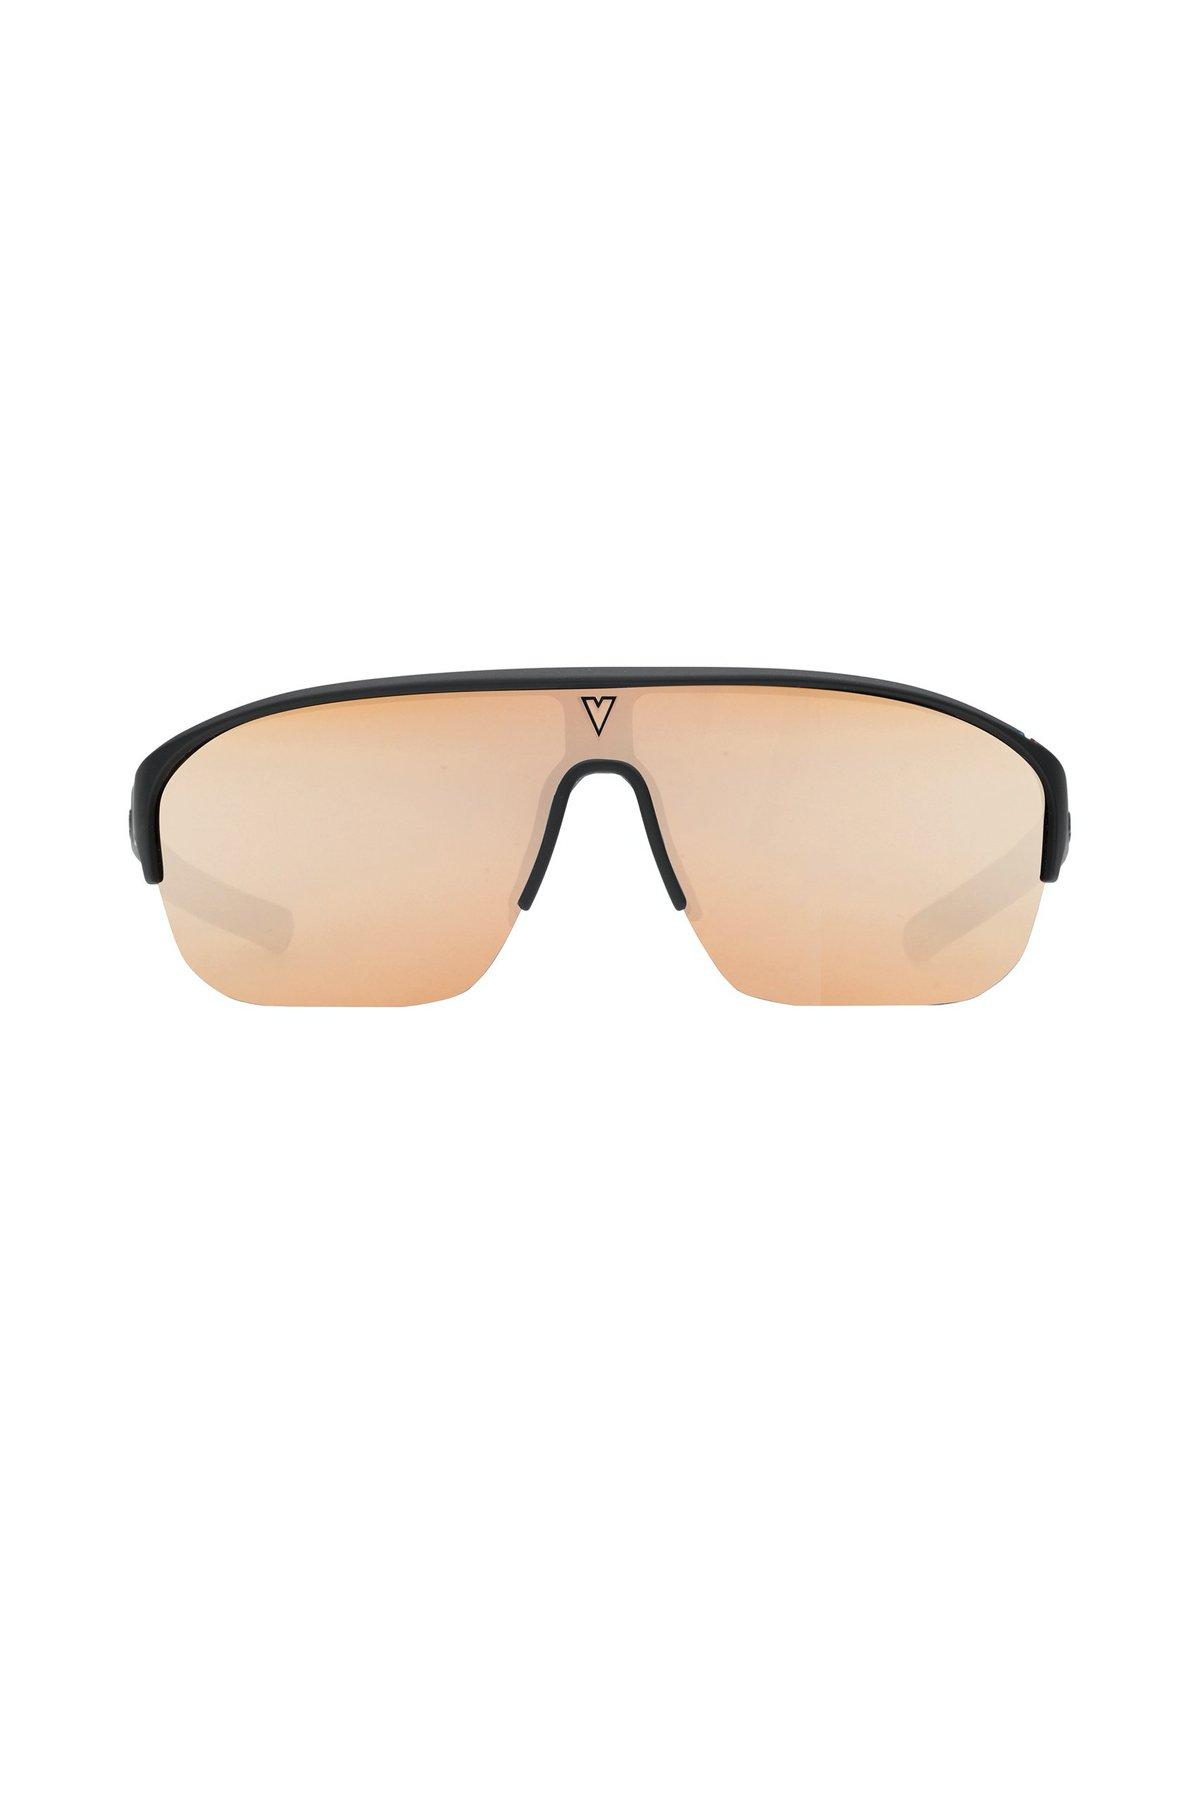 Solbriller til trening